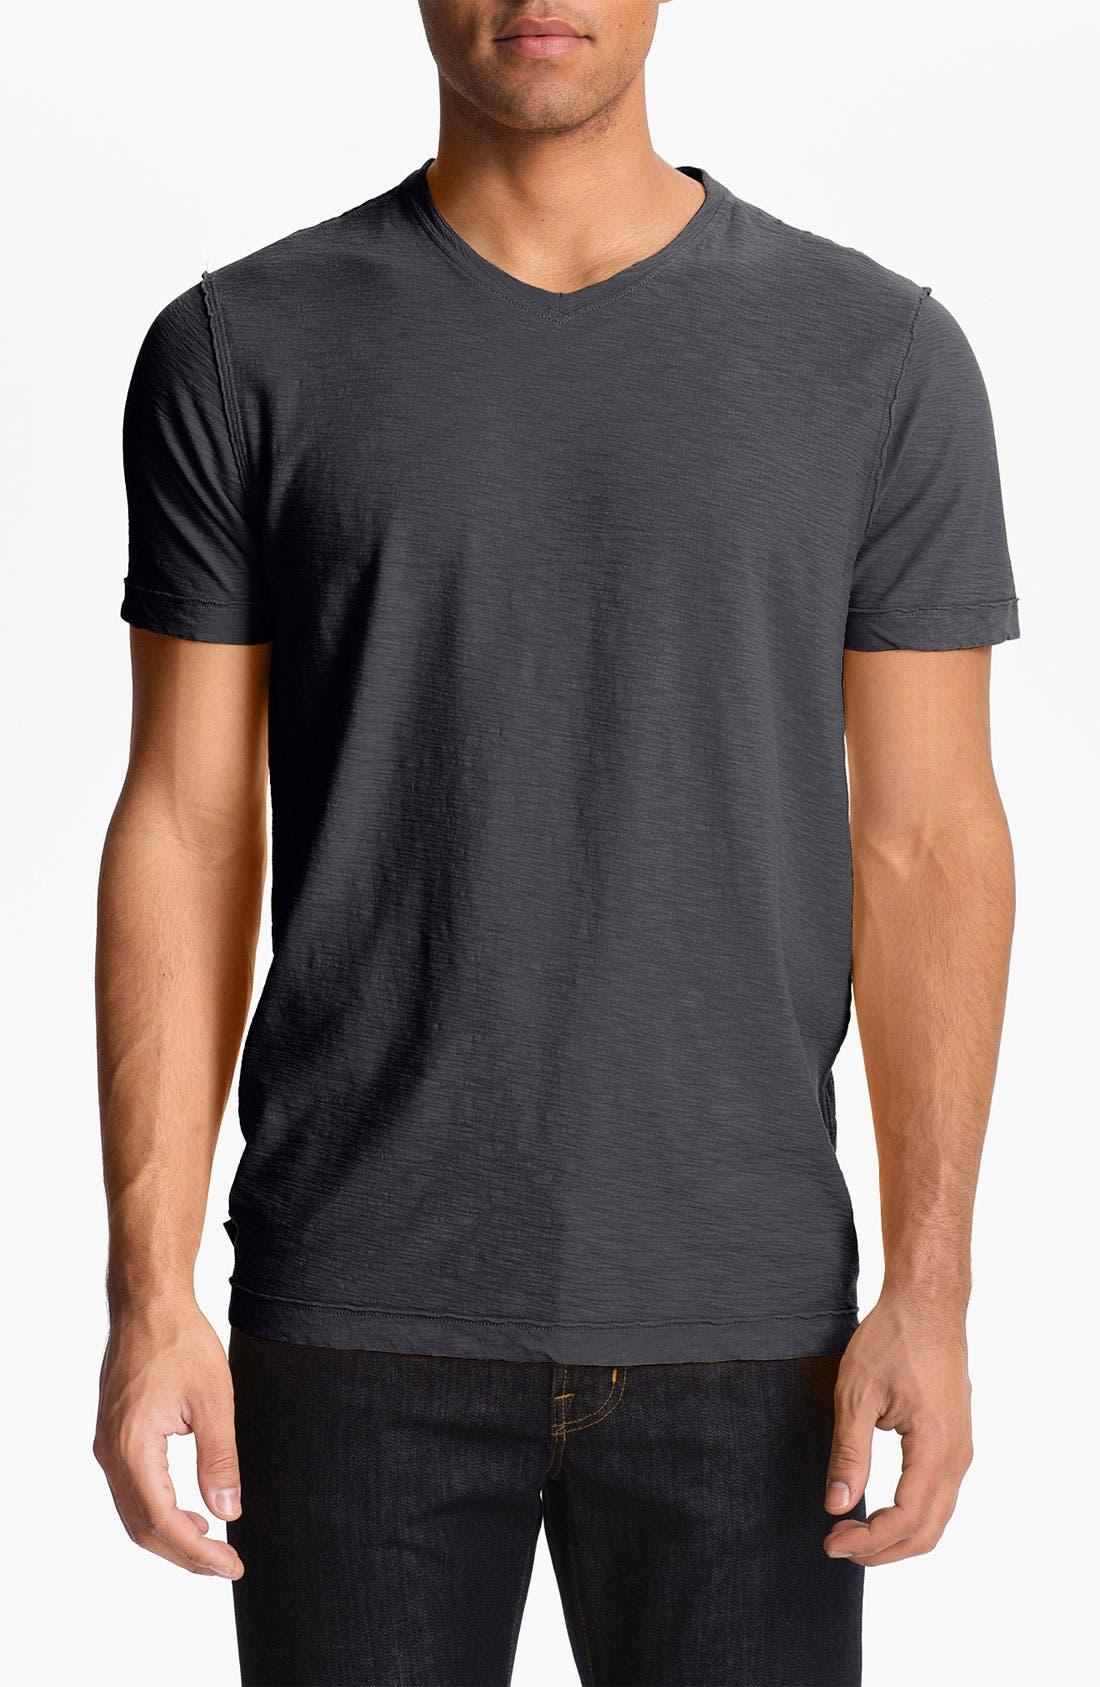 Main Image - Cutter & Buck 'Arbor Heights' V-Neck T-Shirt (Big & Tall)